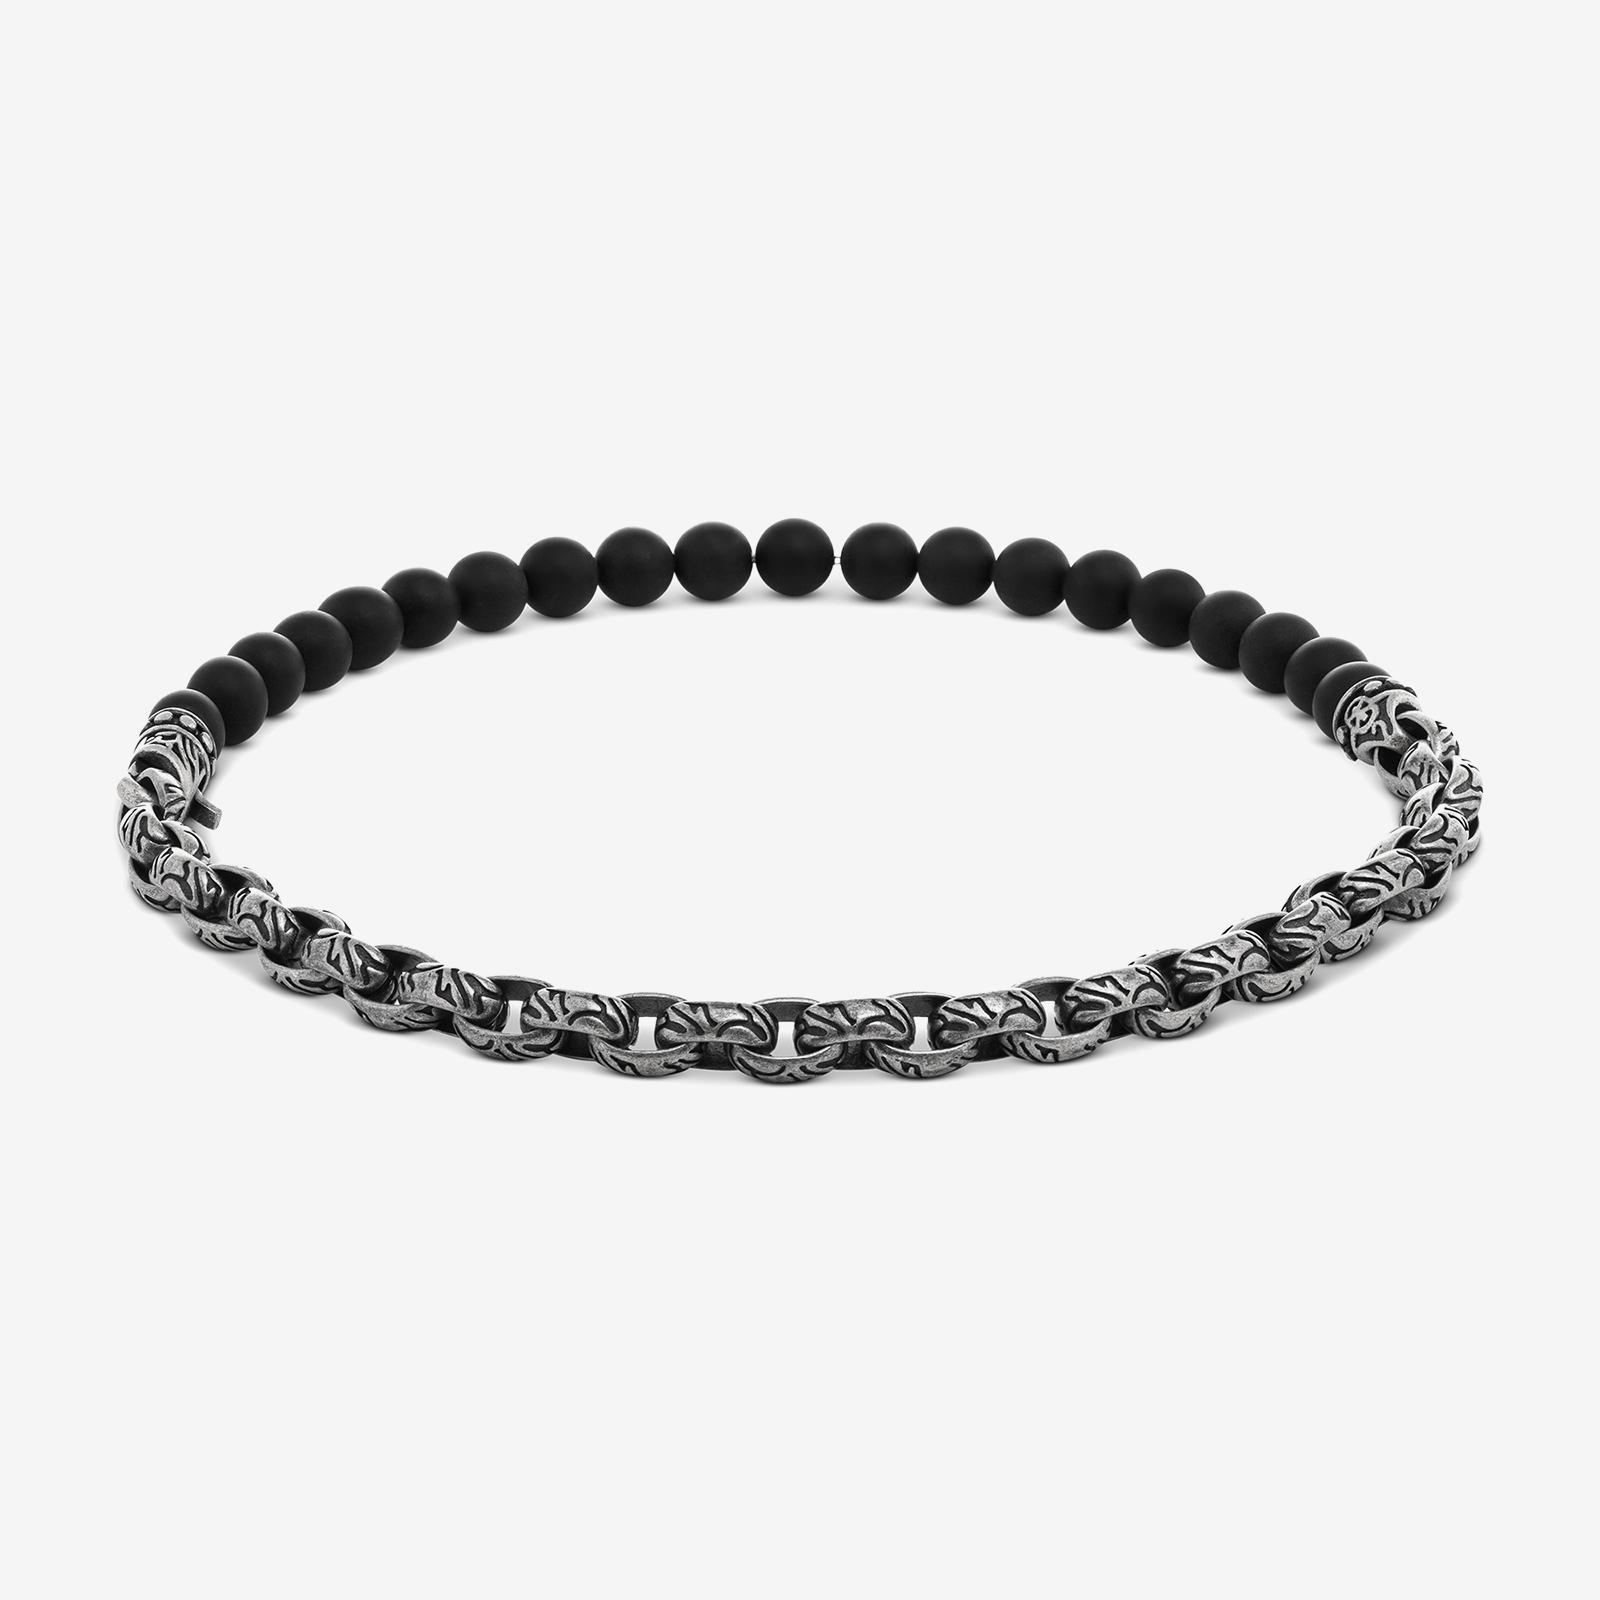 Bracelet product photography